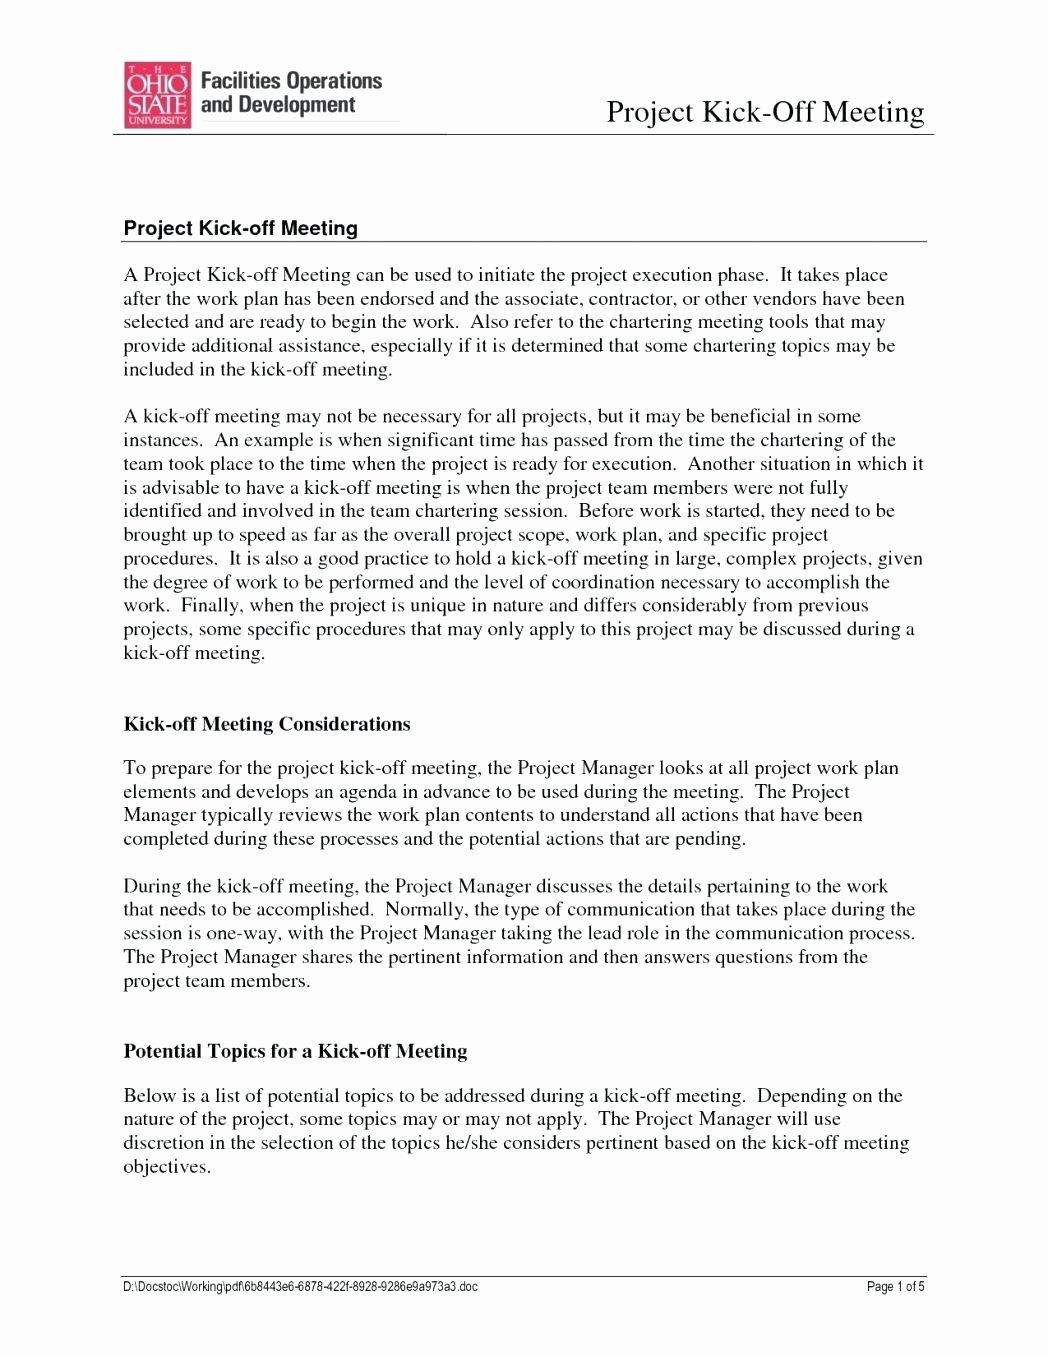 Kick Off Meeting Template Unique Preparing Meeting Agenda Project Status Meeting Agenda